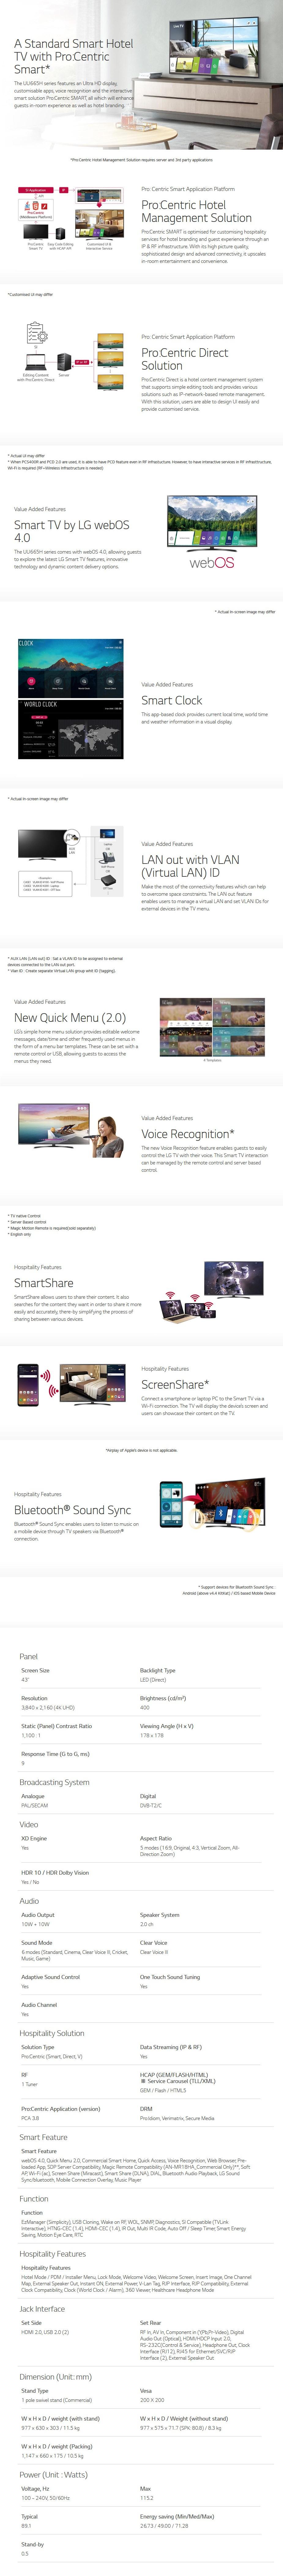 "LG 43UU665H 43"" 4K UHD TV ProCentric Commercial TV - Desktop Overview 1"